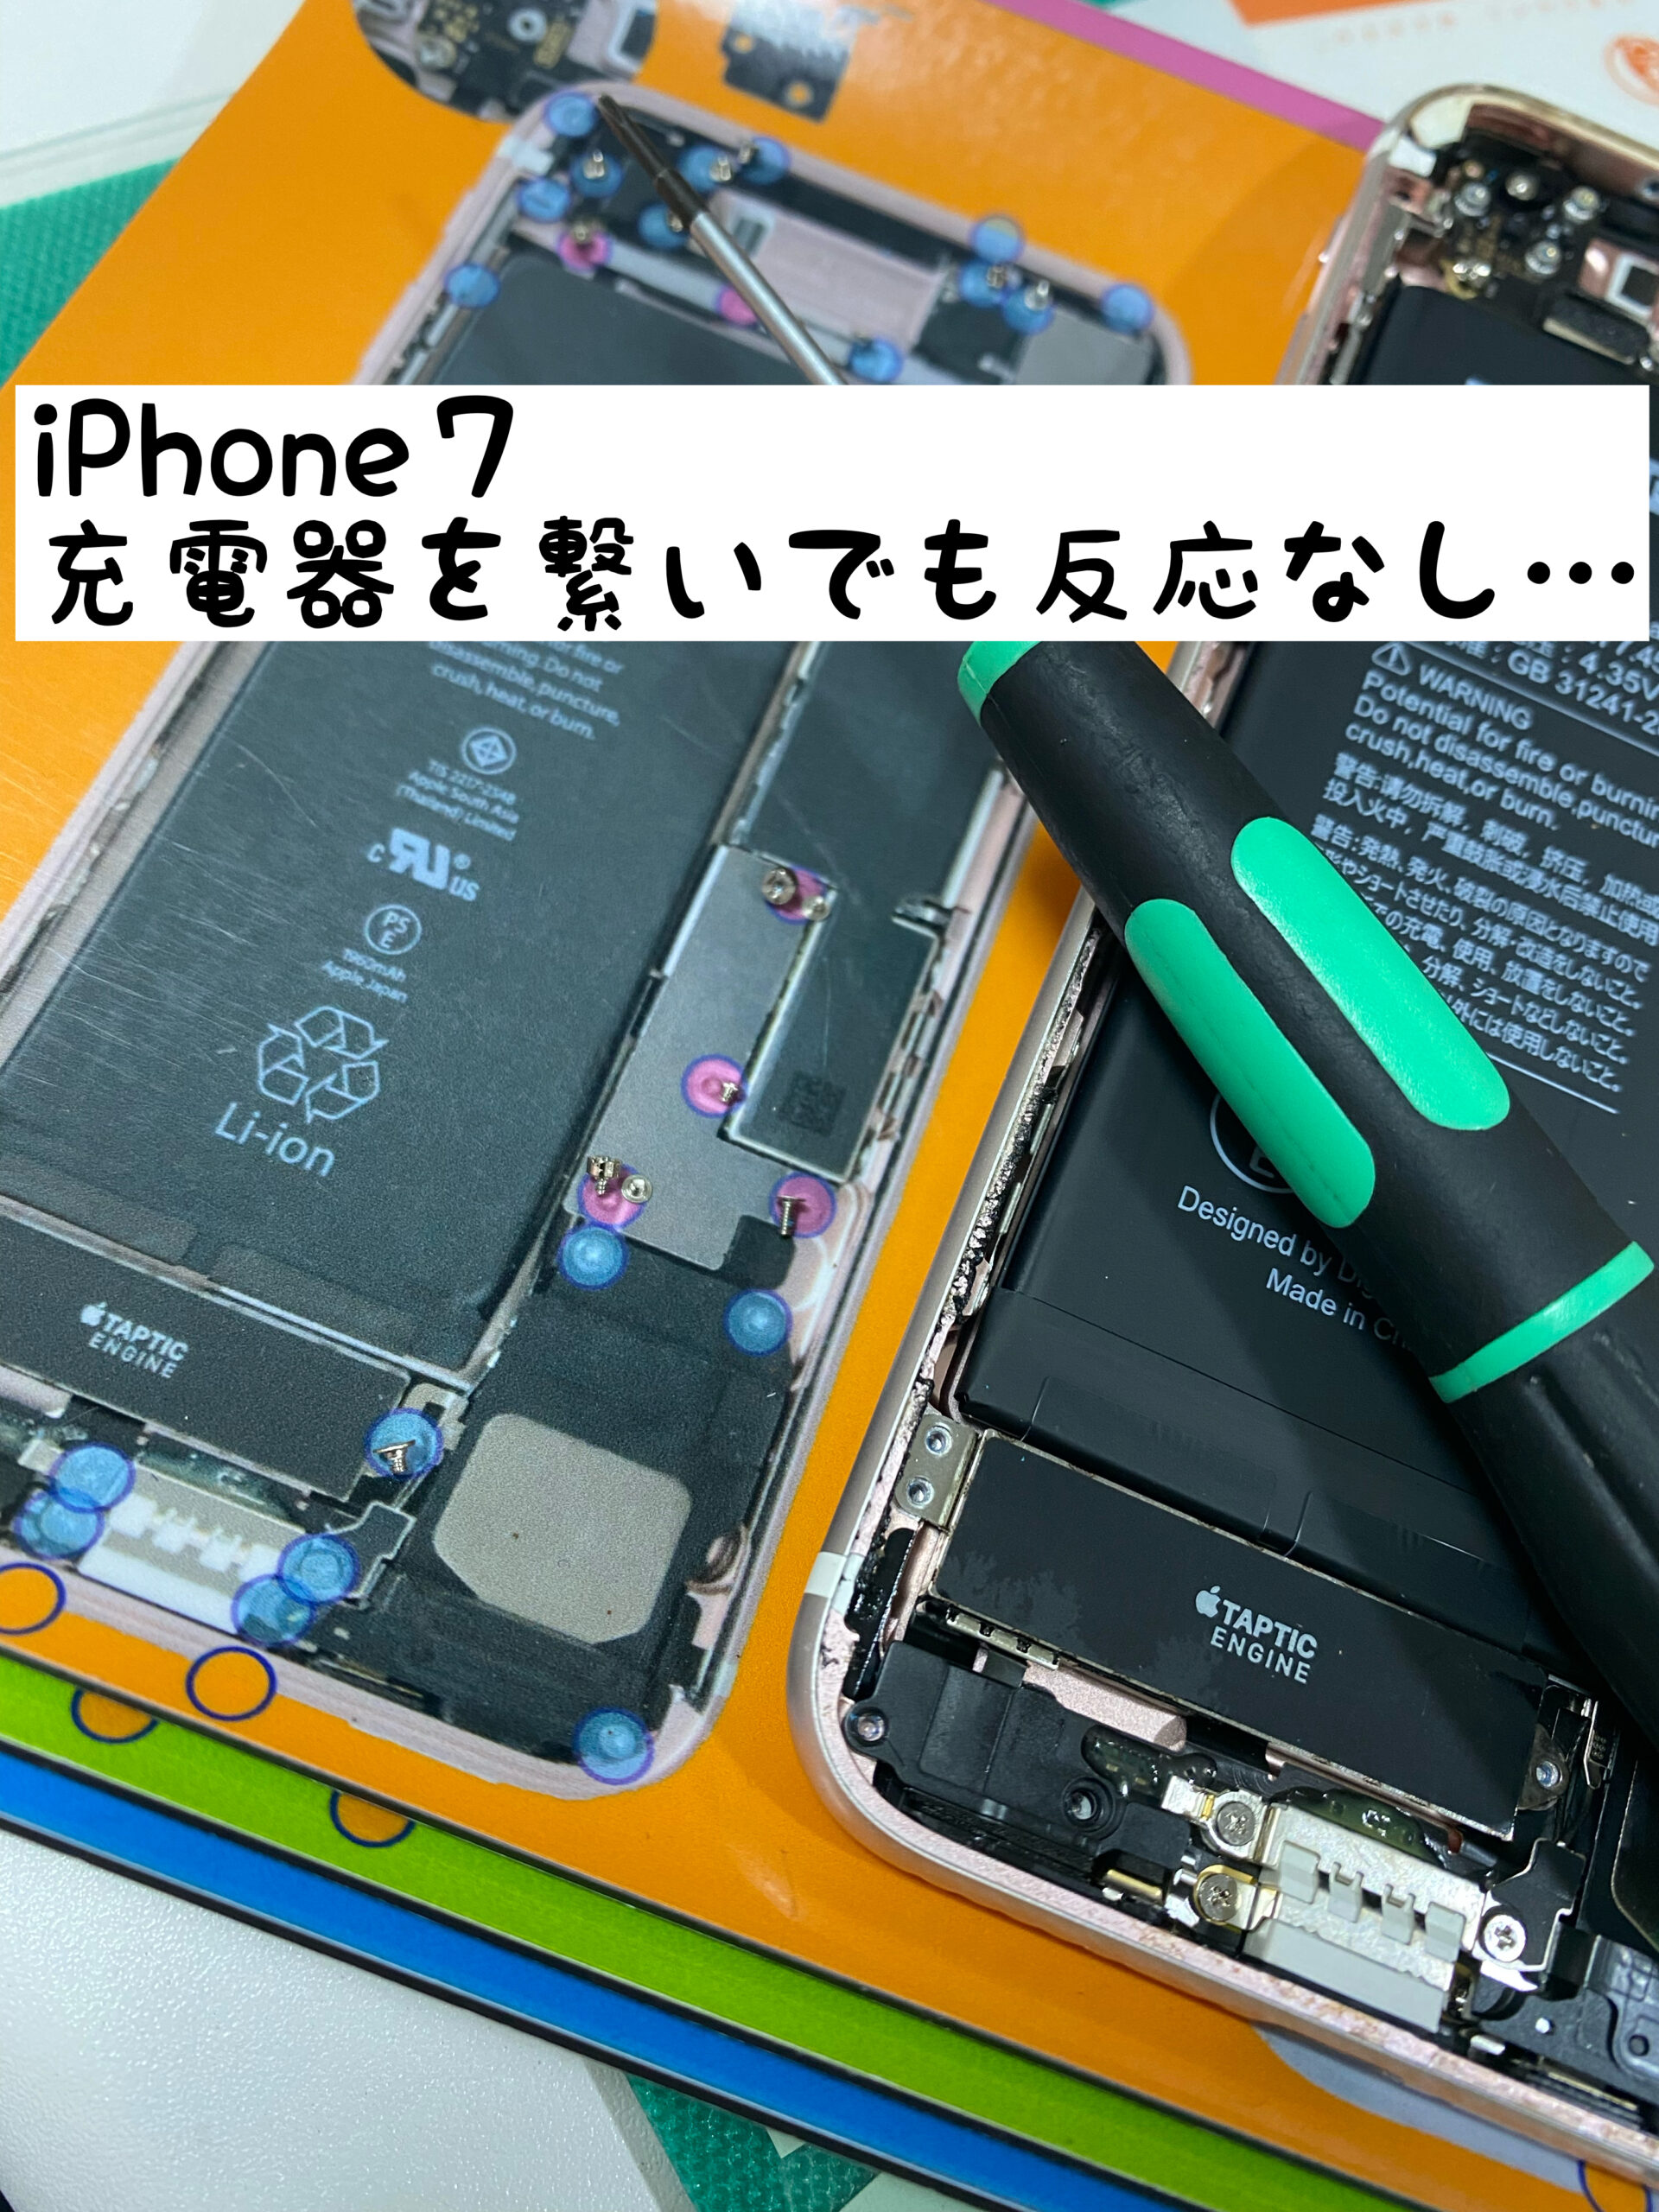 iPhone 充電が出来ない iPhone修理 スマホ修理 ドンキ 扶桑町 江南市 大口町 犬山市 可児市 岐阜 一宮